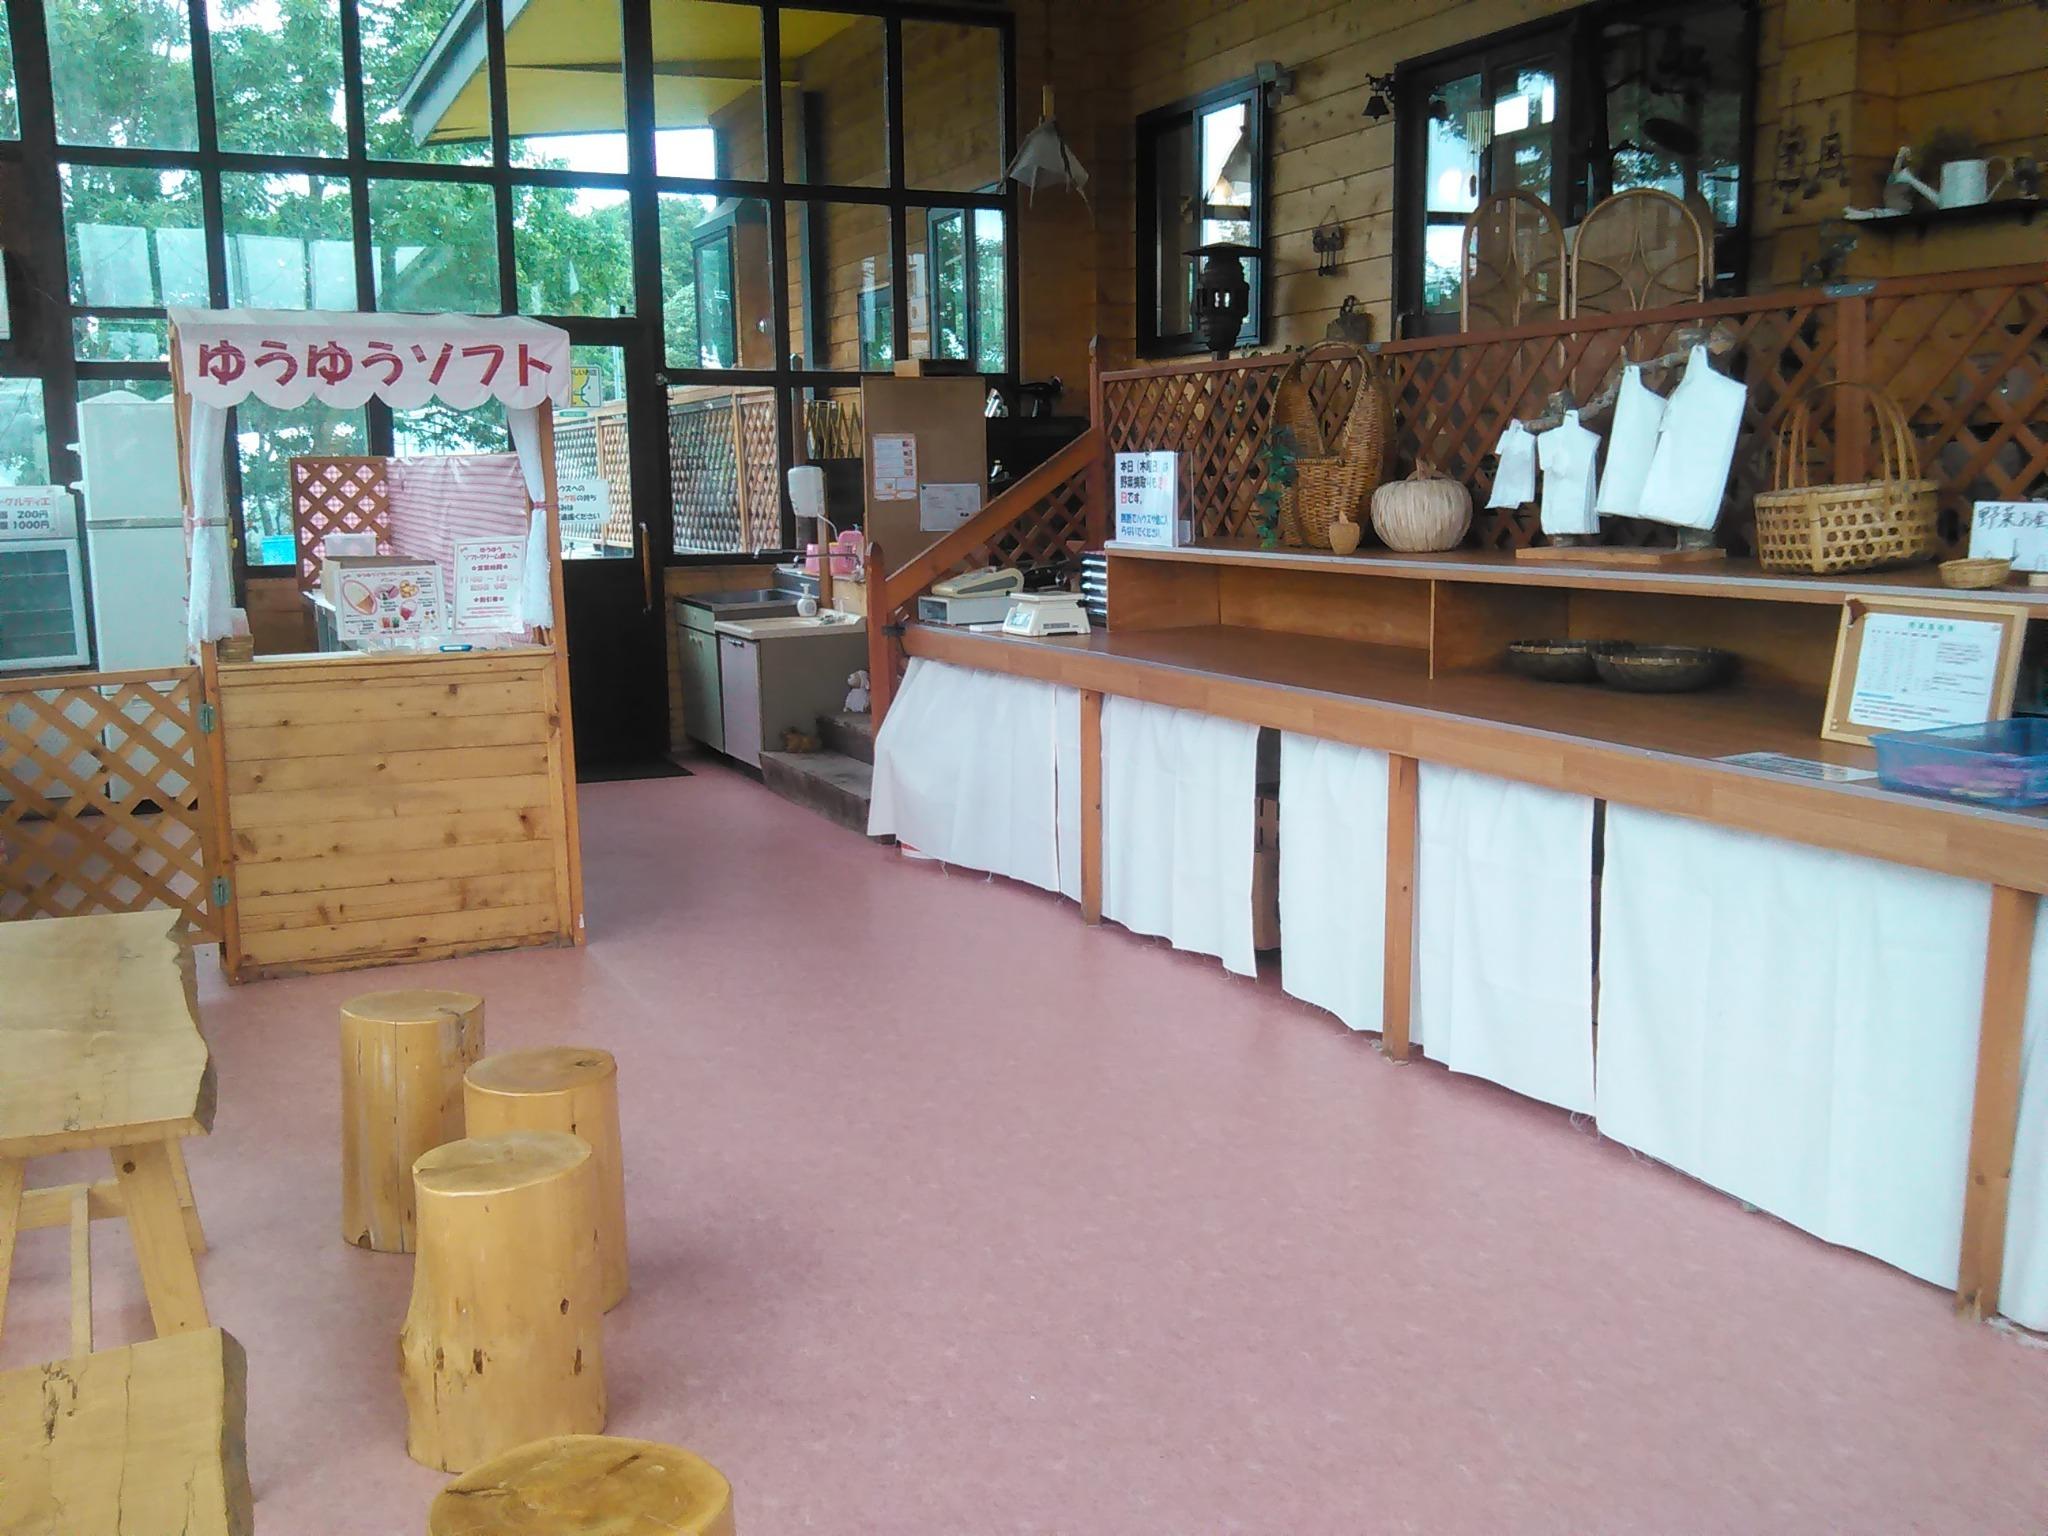 【Soft ice cream & Vegetable Shop】